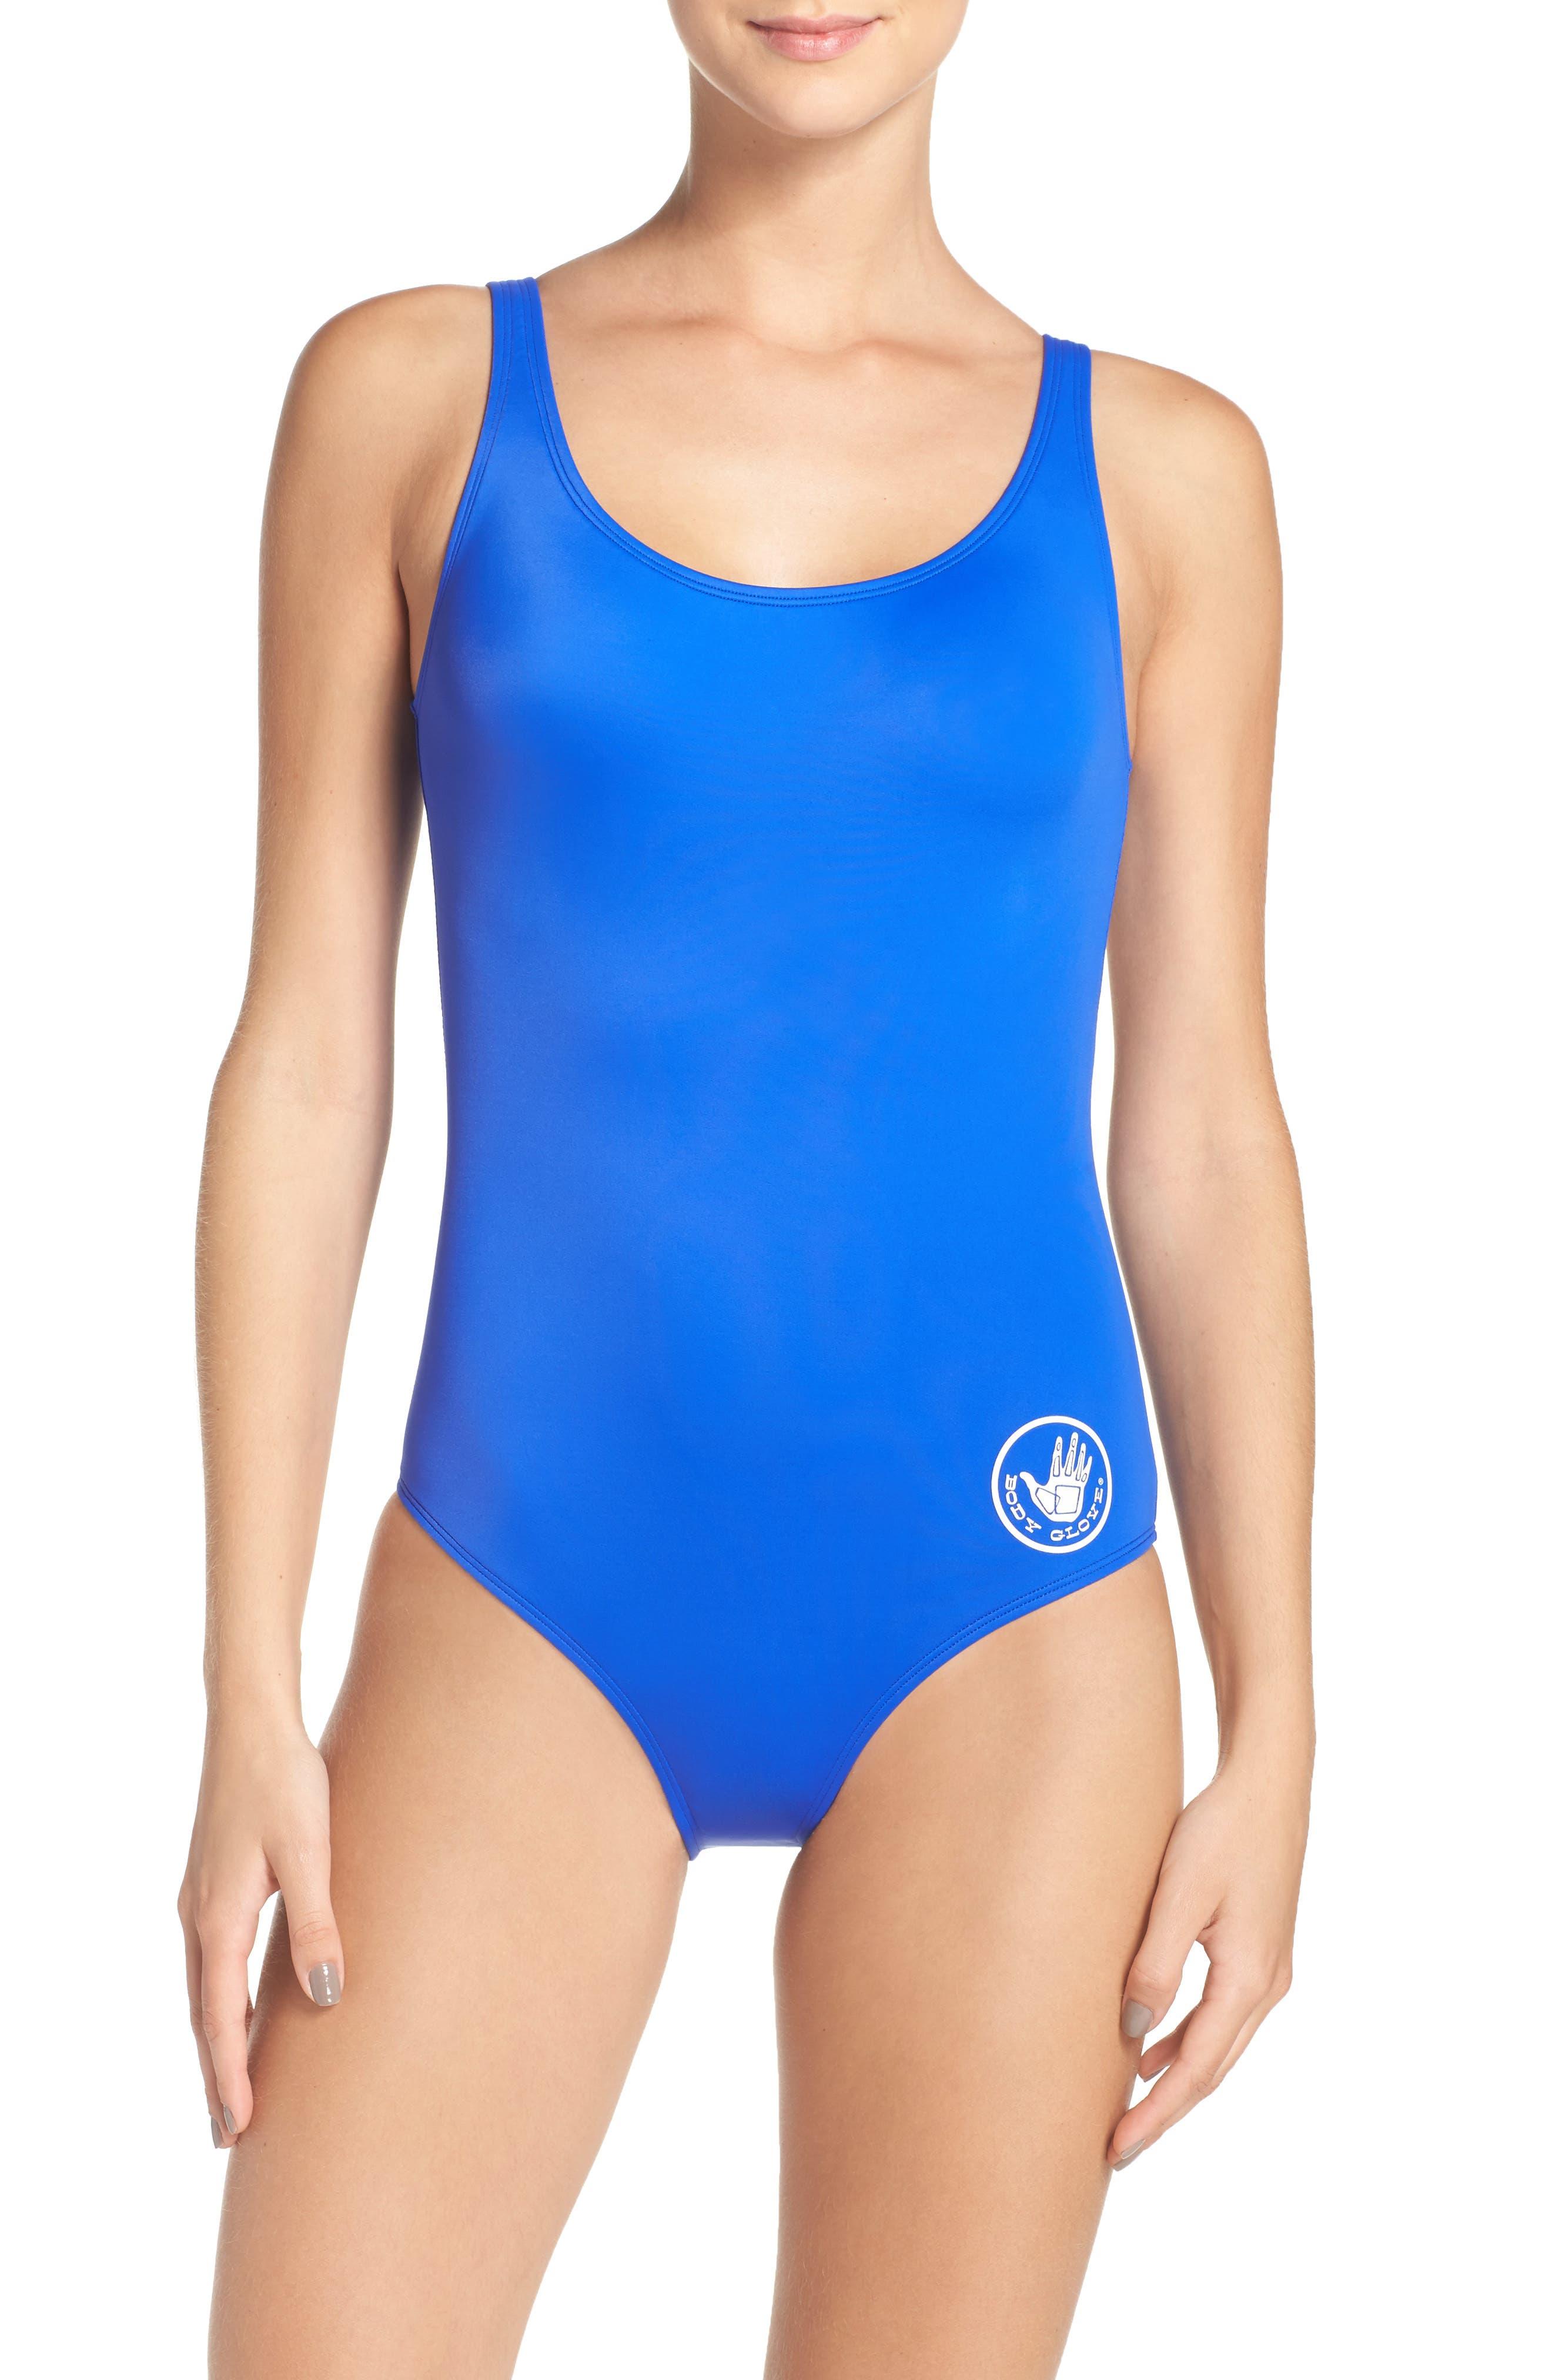 Body Glove Smoothies U & Me One-Piece Swimsuit